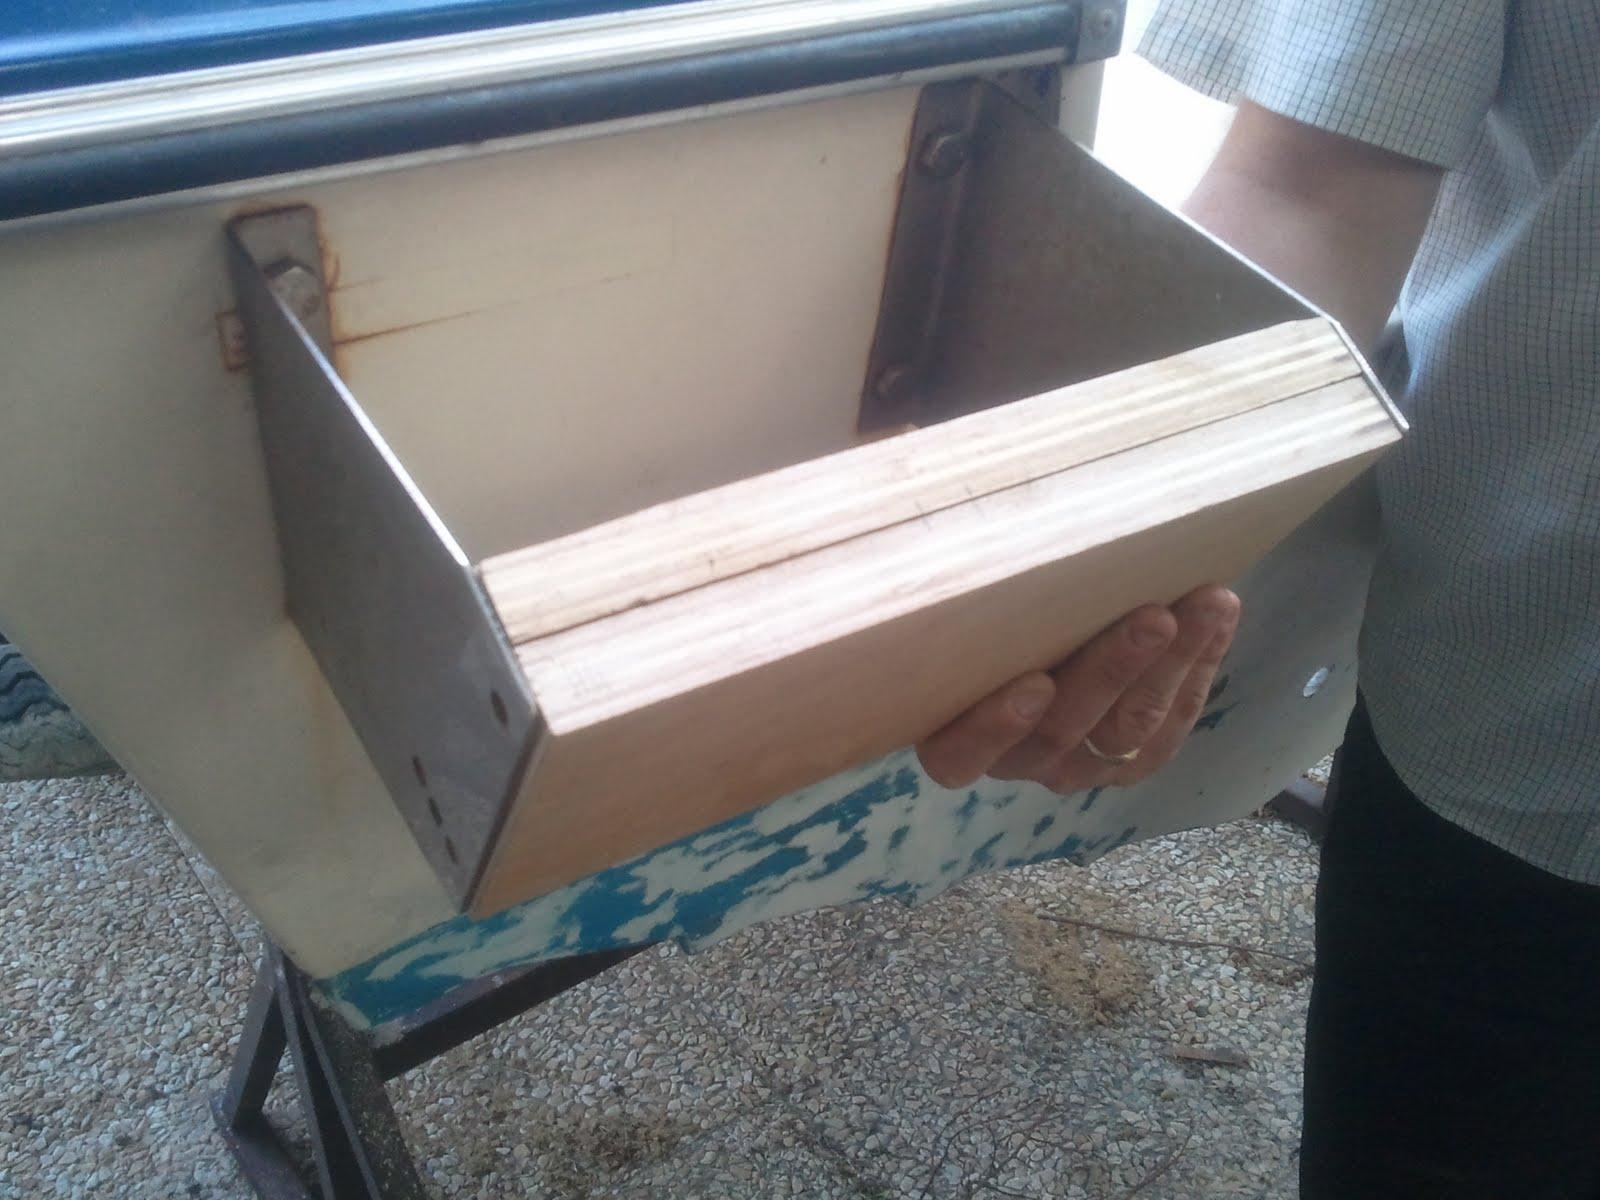 restauration bateau riamar 490 evinrude 60 vro support moteur de secours pon age gel coat. Black Bedroom Furniture Sets. Home Design Ideas